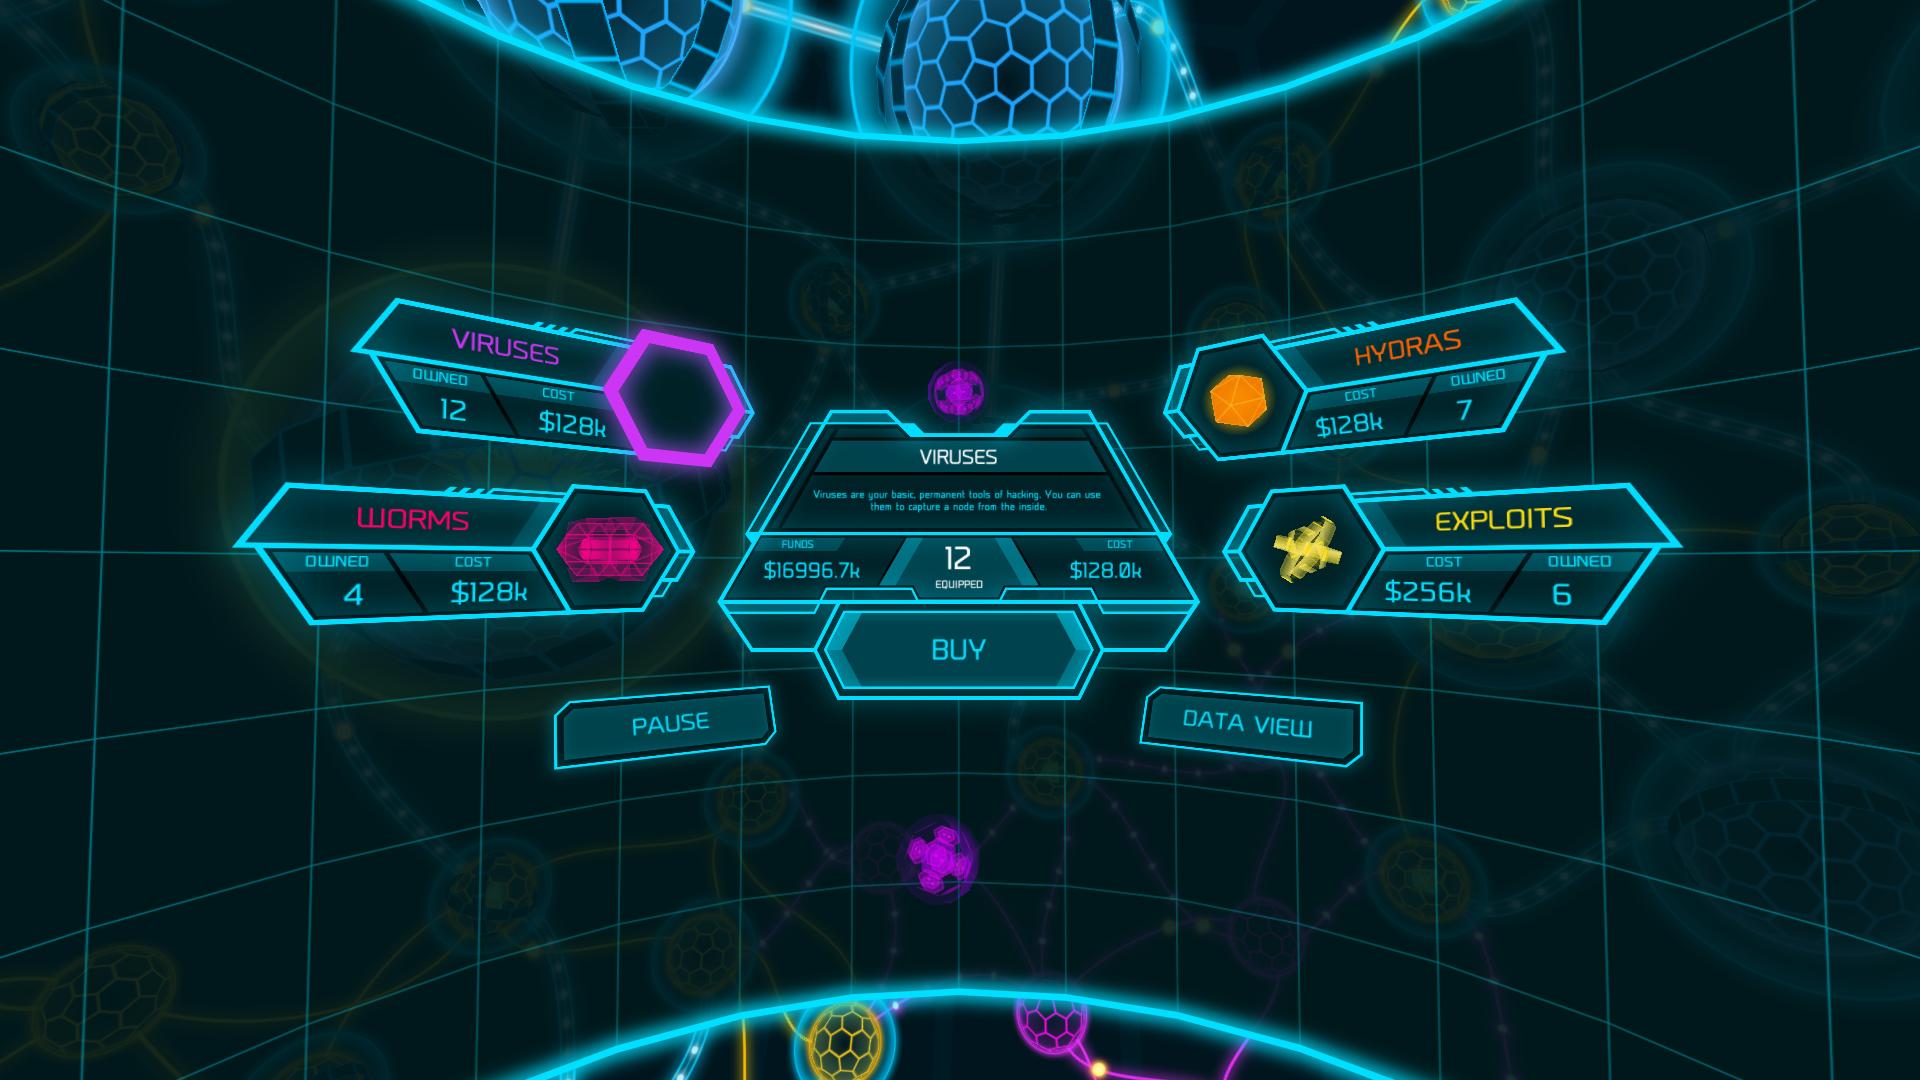 Image result for vr menus in game